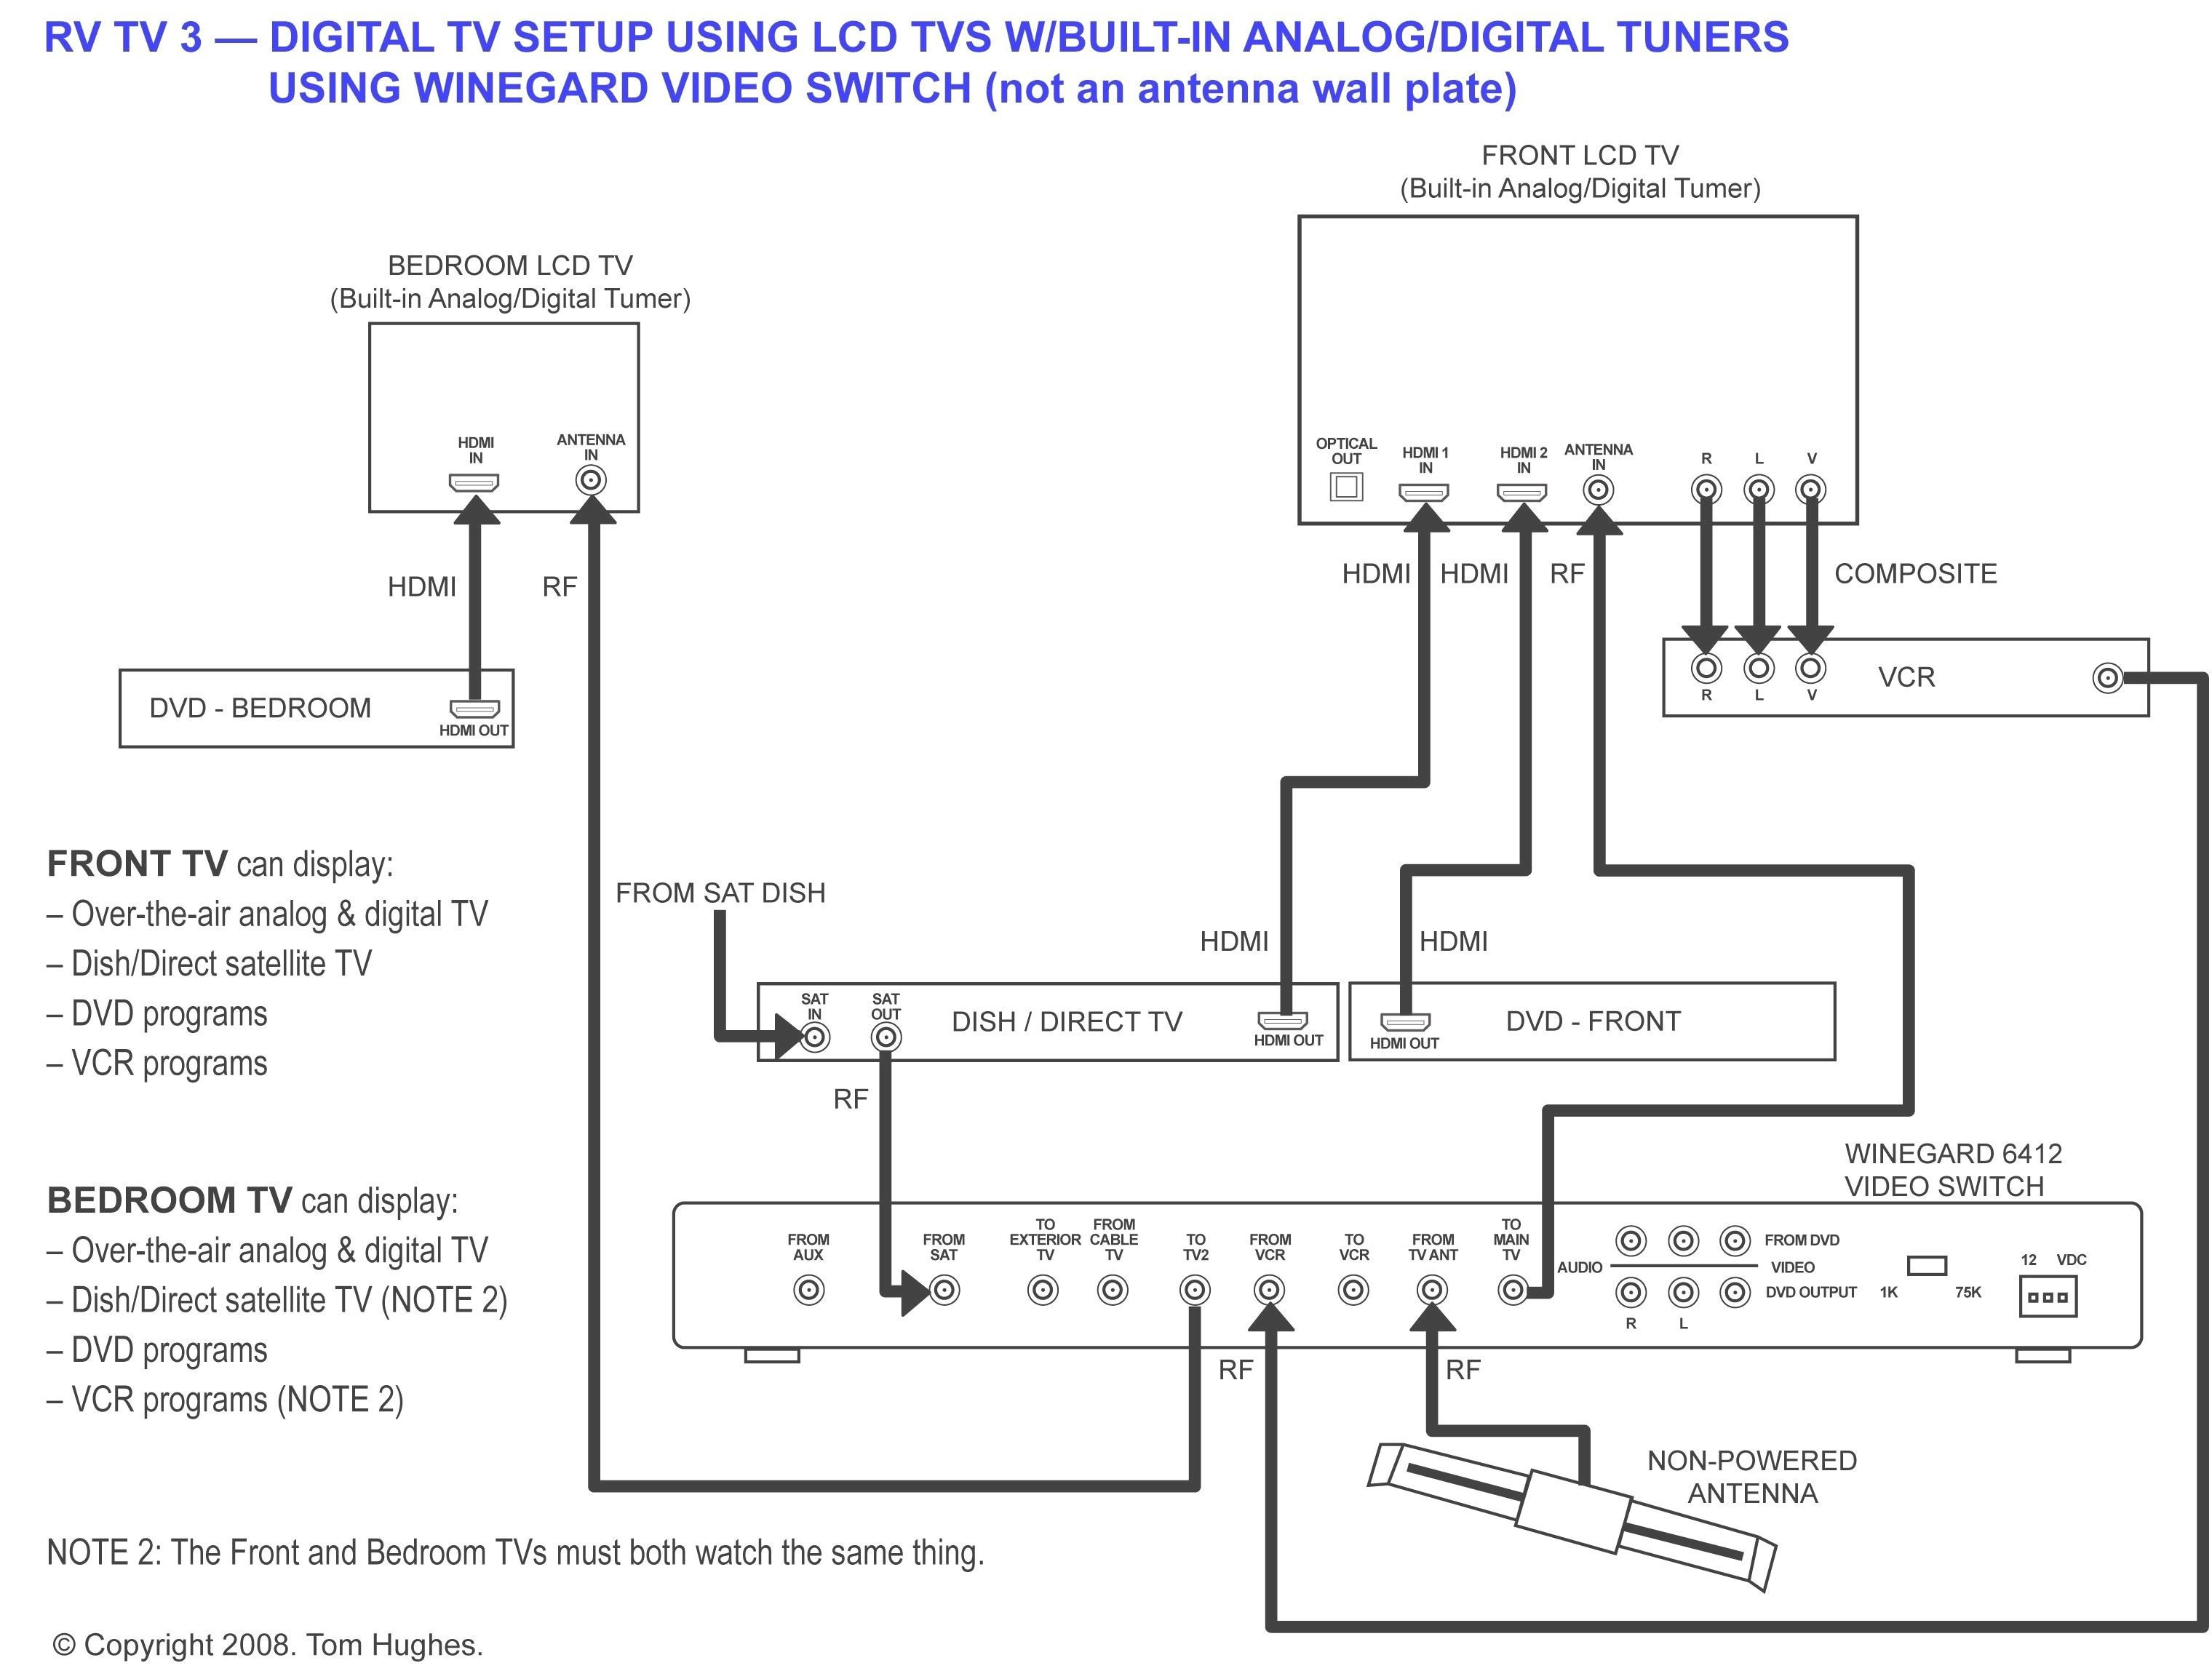 Electrical Schematics Explained Elegant In 2020 Electrical Circuit Diagram Trailer Wiring Diagram Electrical Diagram